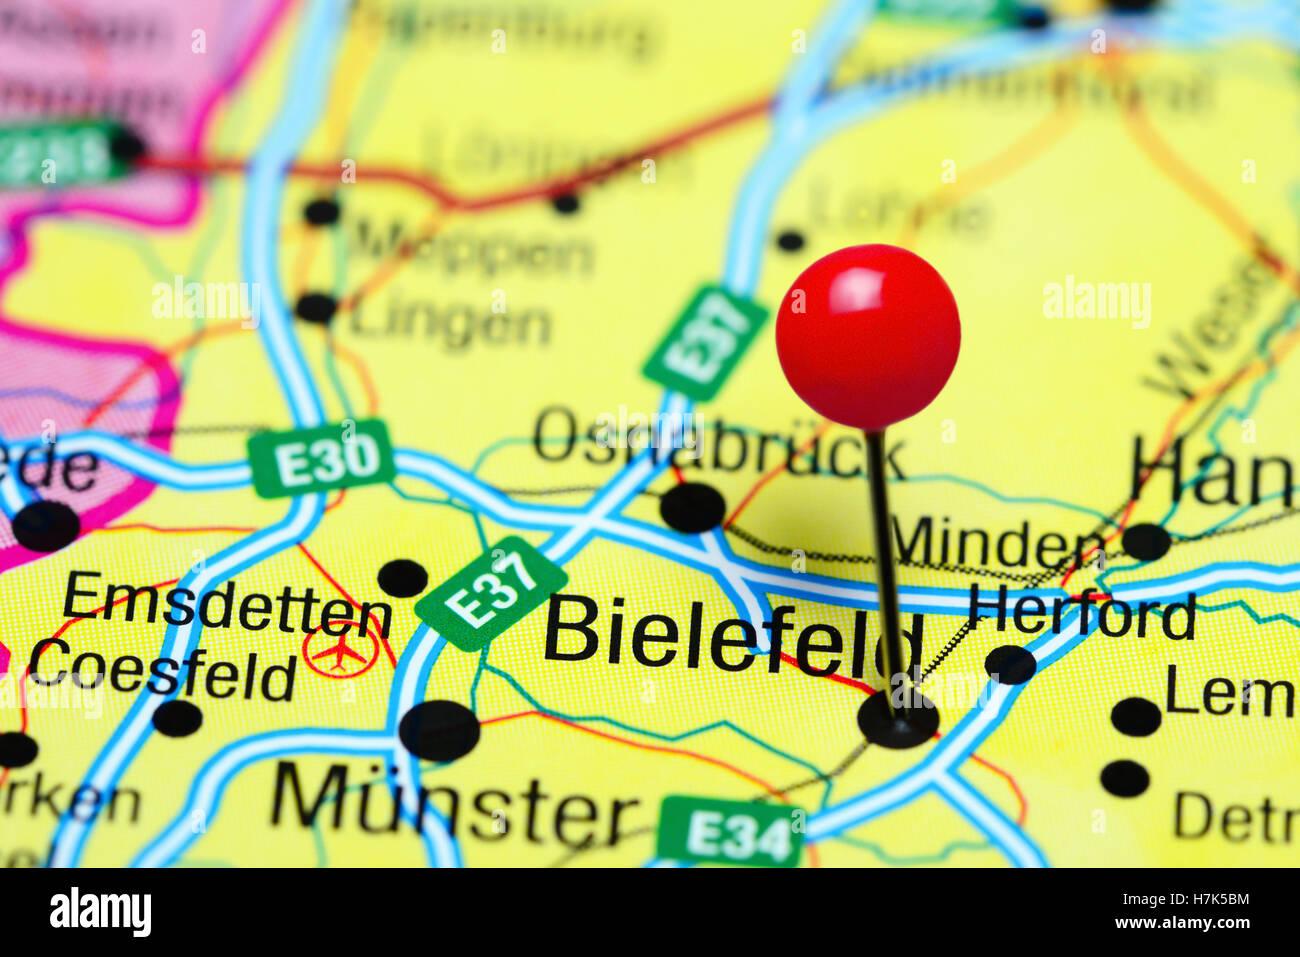 Bielefeld Stock Photos Bielefeld Stock Images Alamy